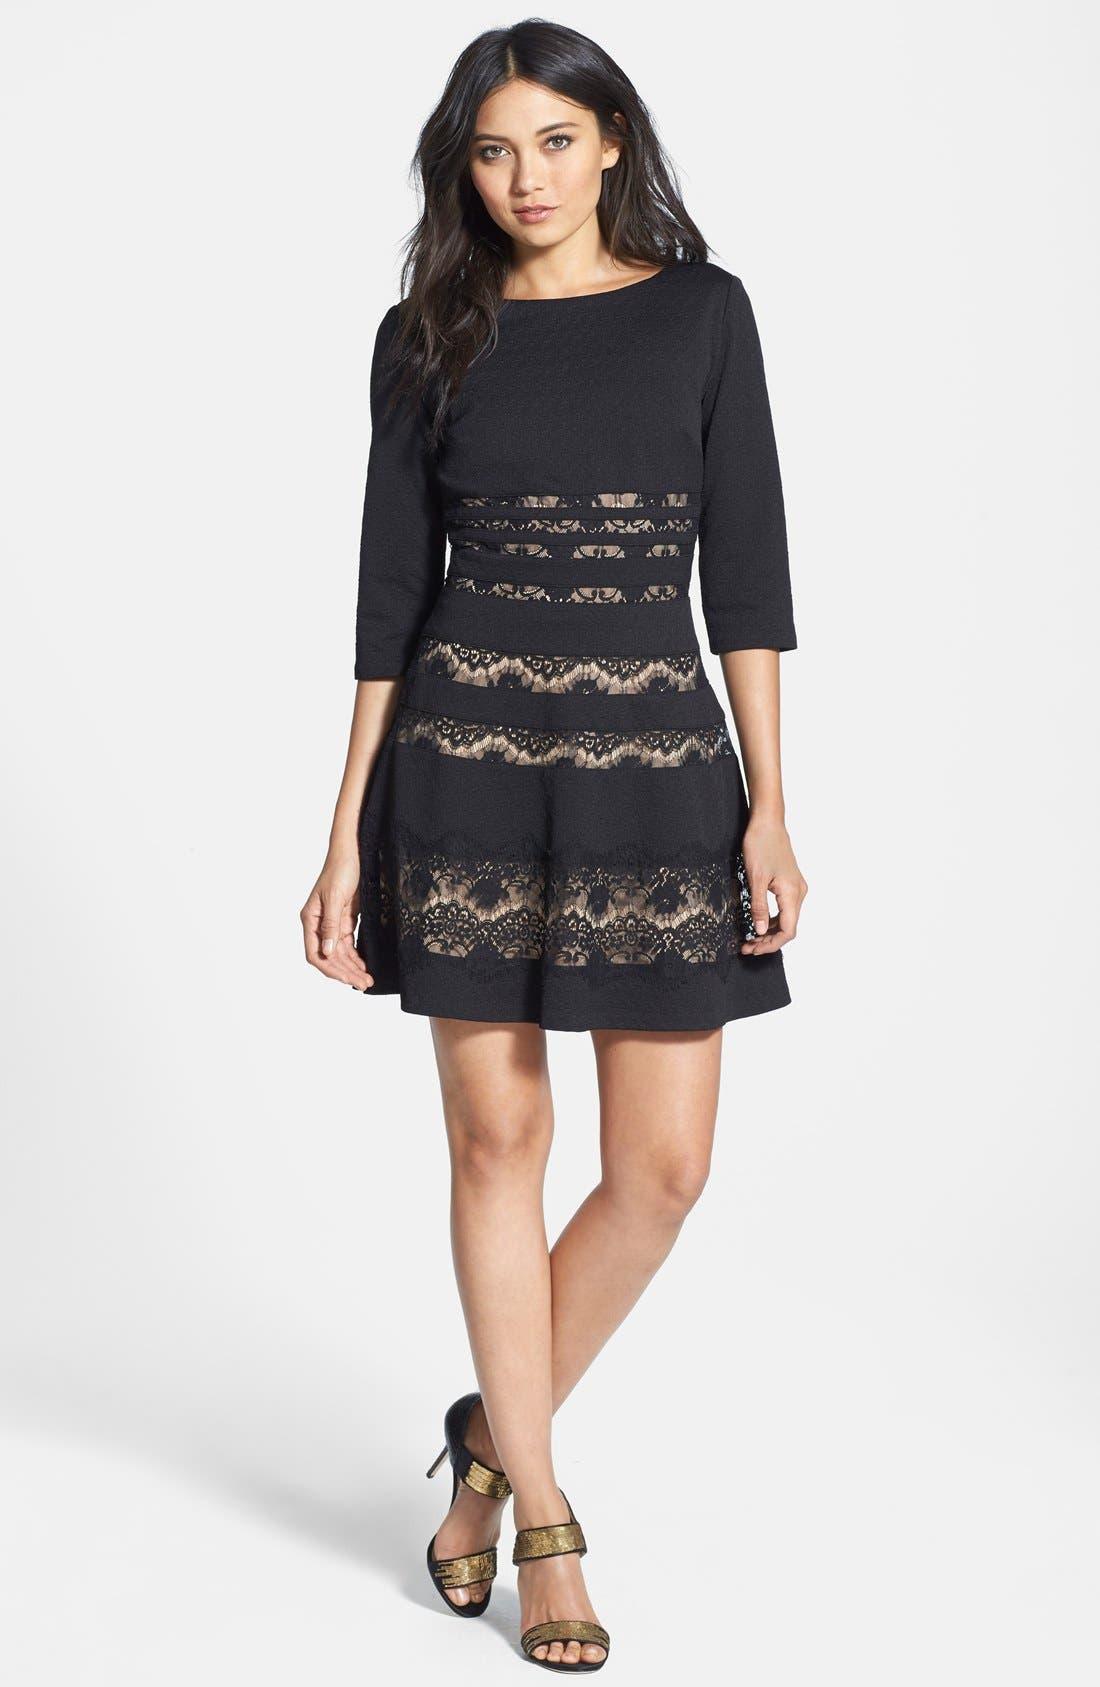 Alternate Image 1 Selected - ERIN erin fetherston 'Millie' Lace Inset Ponte Fit & Flare Dress